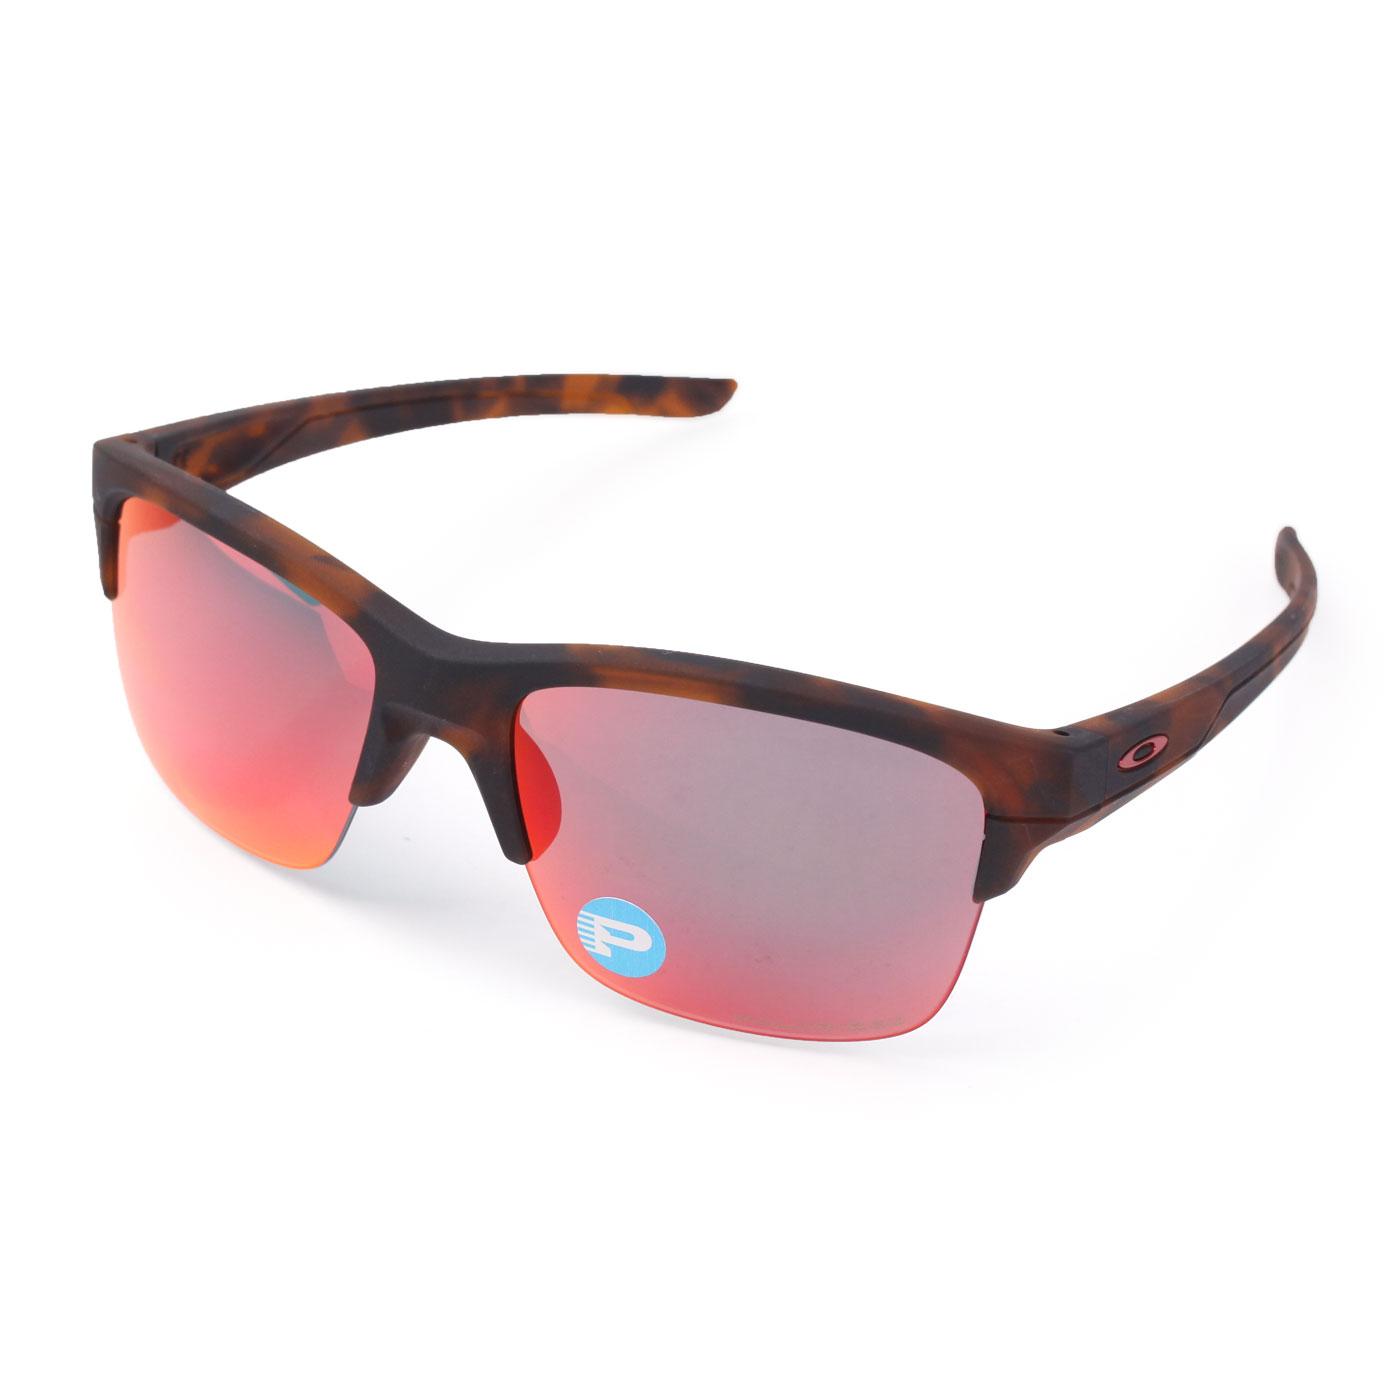 OAKLEY THINLINK  偏光運動休閒兩用太陽眼鏡 (附鏡袋無鼻墊) OAK-OO9317-06 - 咖啡紅